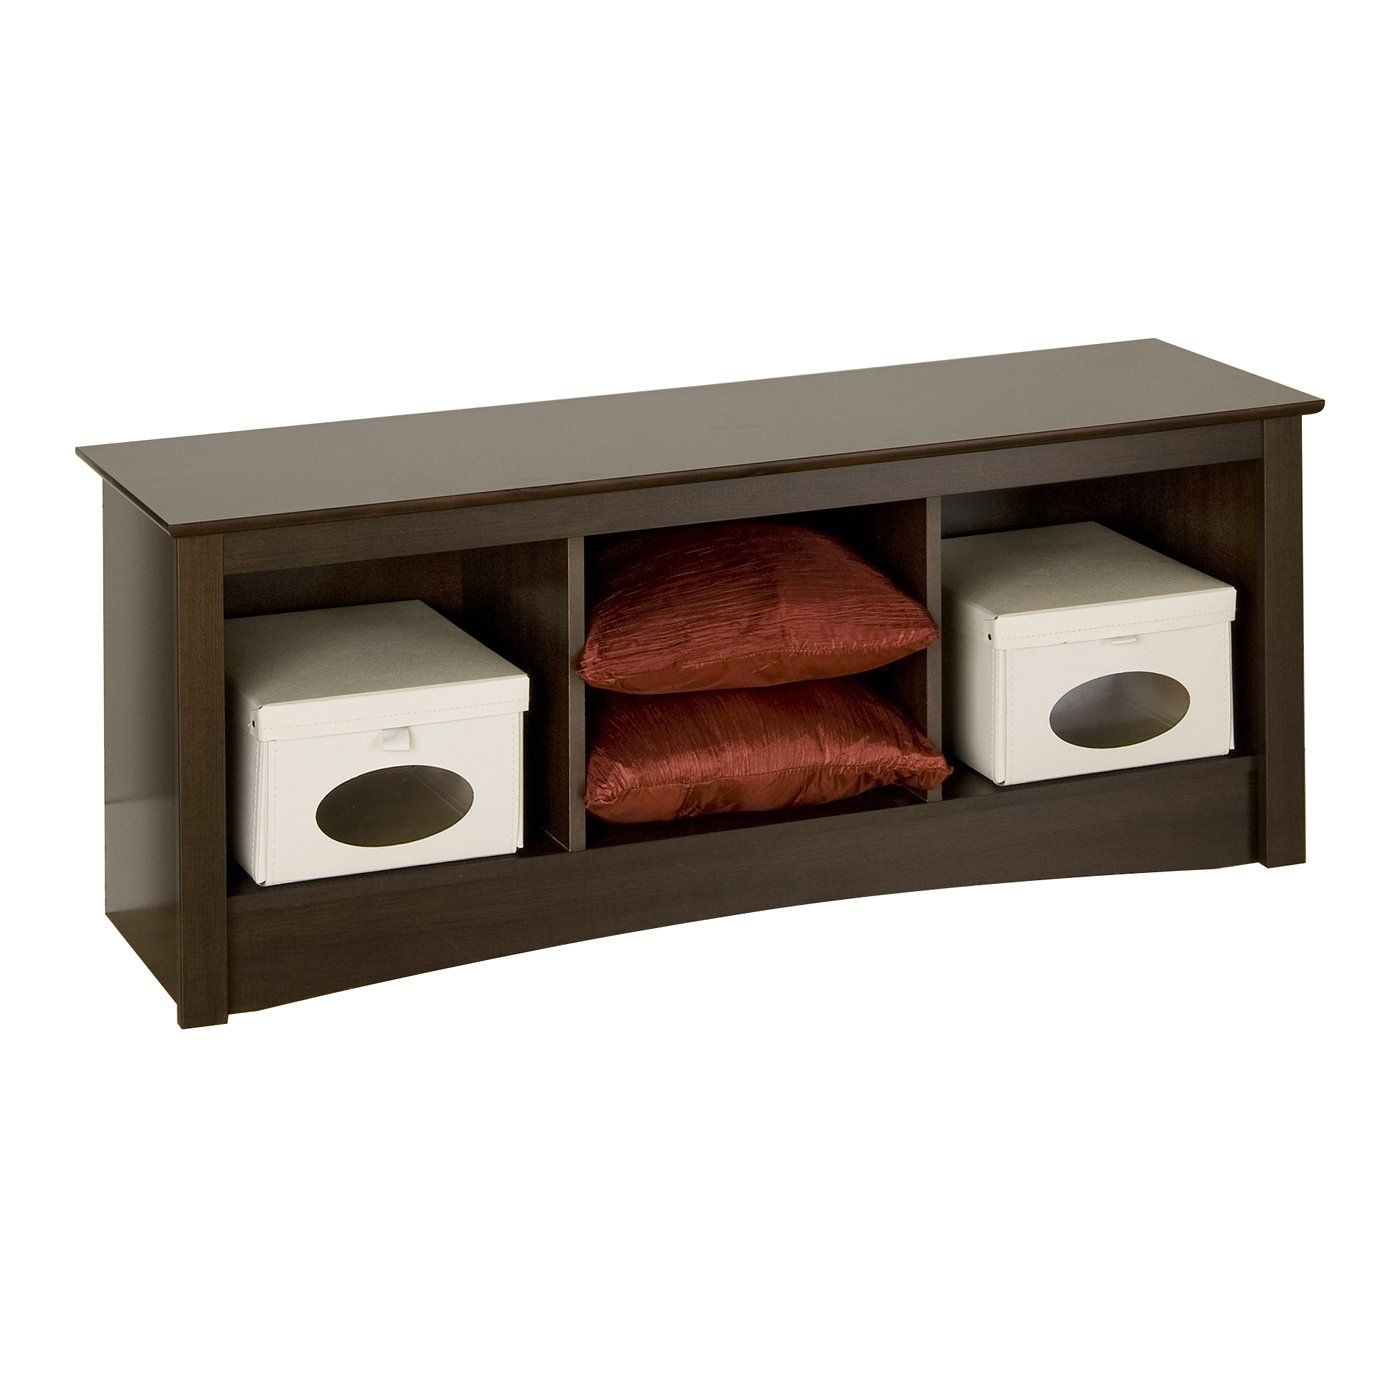 Incredible Prepac Furniture Esc 4820 Fremont Cubbie Bench Lowes Pabps2019 Chair Design Images Pabps2019Com